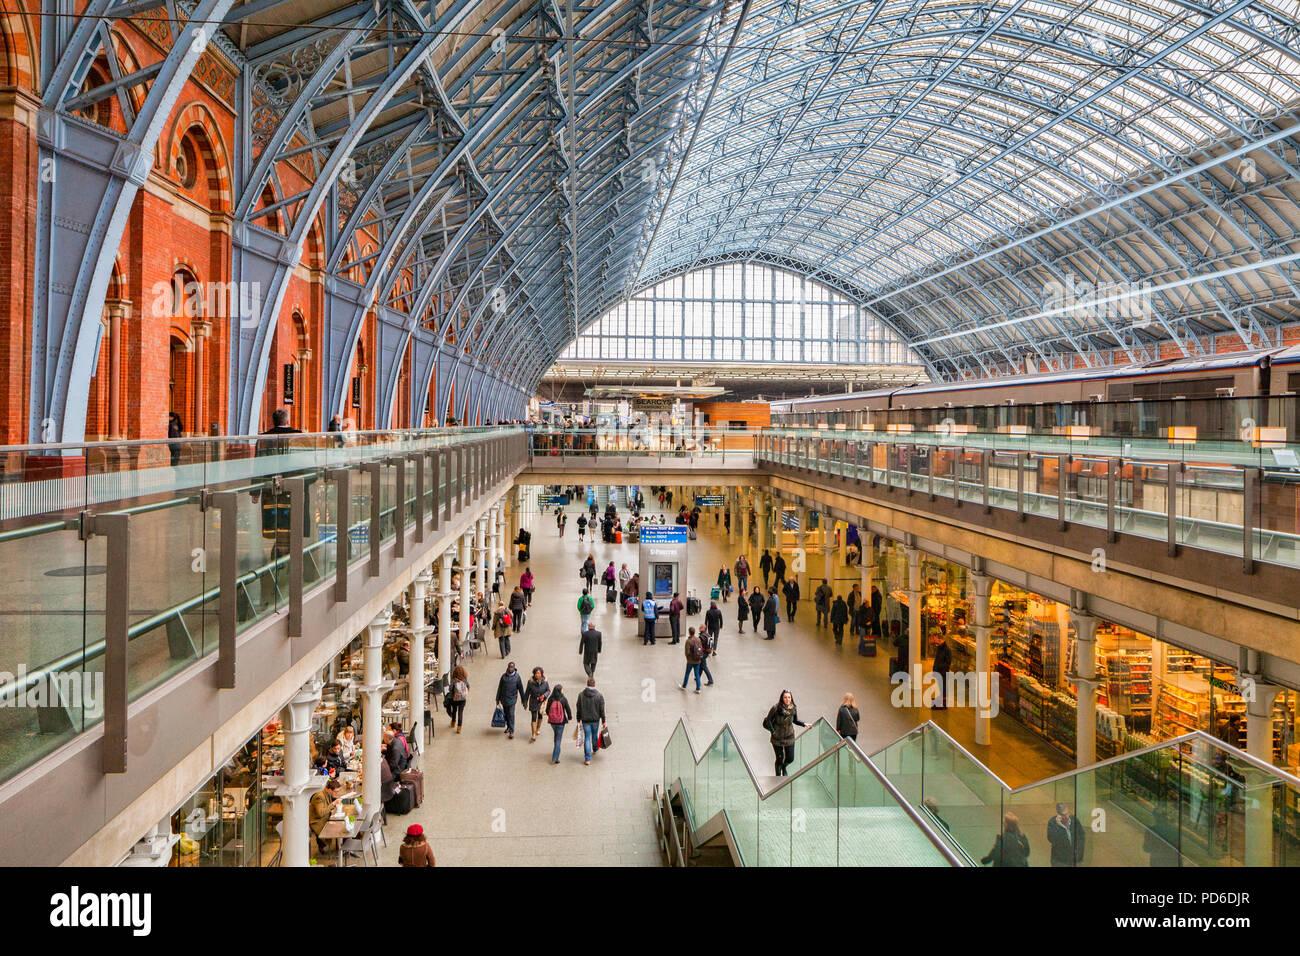 The Concourse, St Pancras Station, London, England, UK, - Stock Image